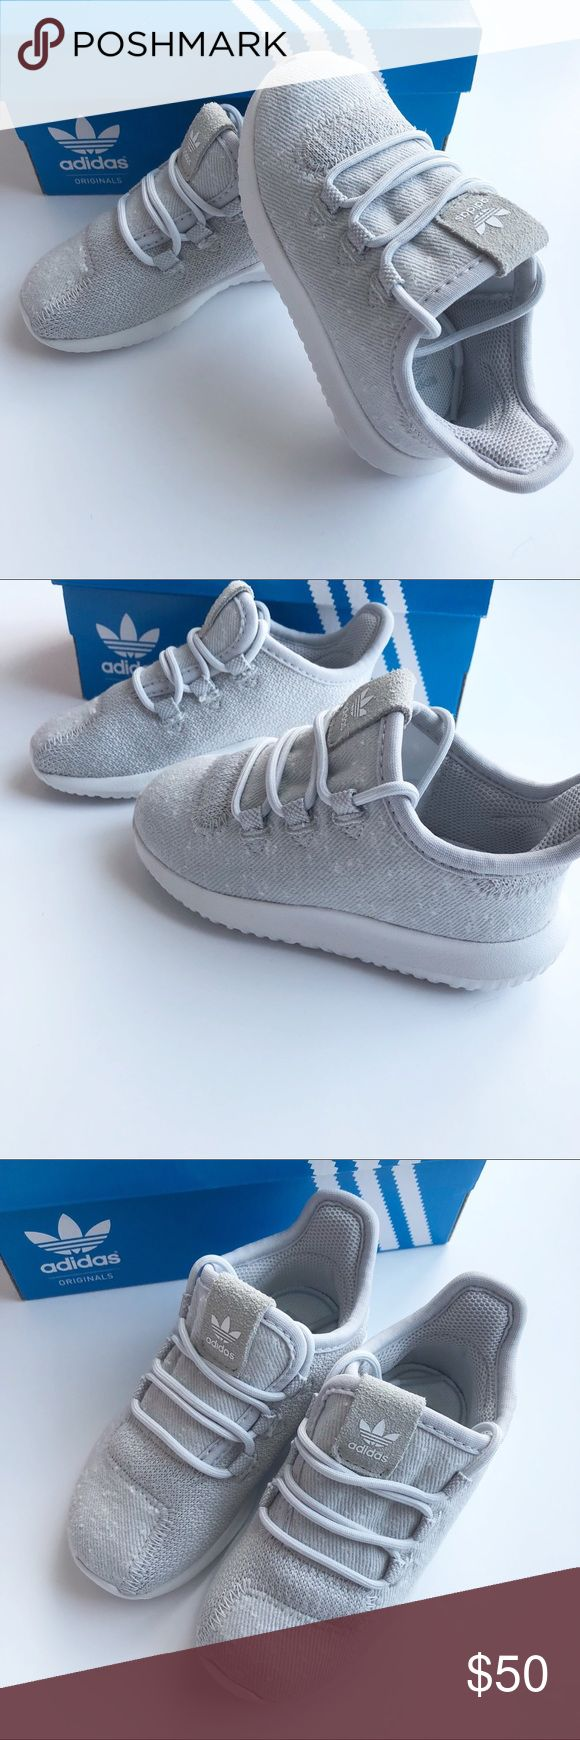 Women Tubular Shadow Lifestyle Shoes Cheap Adidas US